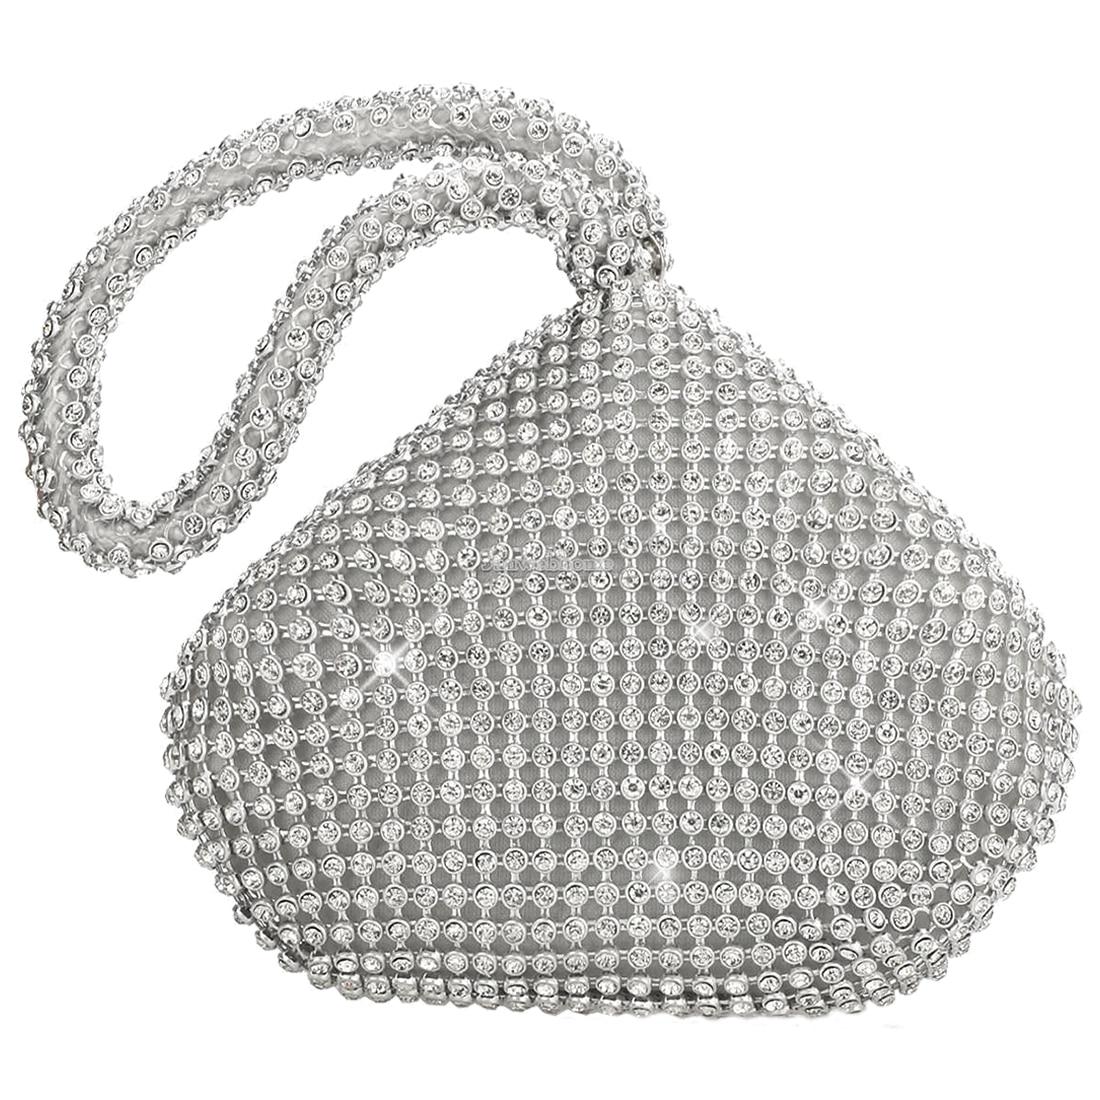 HEBA Chic Women Clutch Bag Fashion Full Drill Trianglar Evening Bags Shining Rhinestones Decor Ladies' Party Handbag